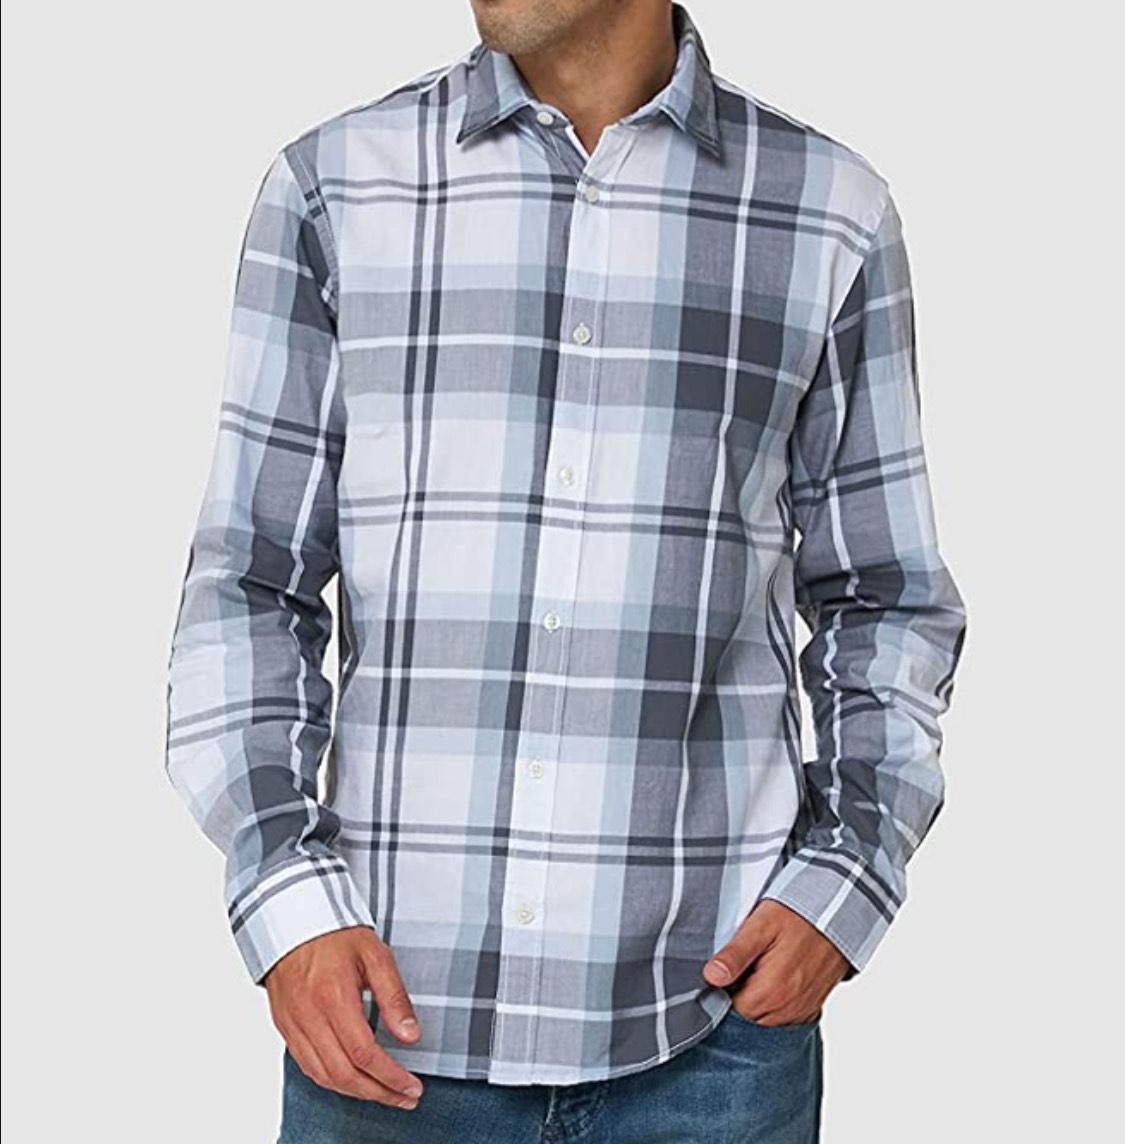 Camisa Jack & Jones adulto talla M (Naranja M a 7,58€ y Blanco S a 9,91€)